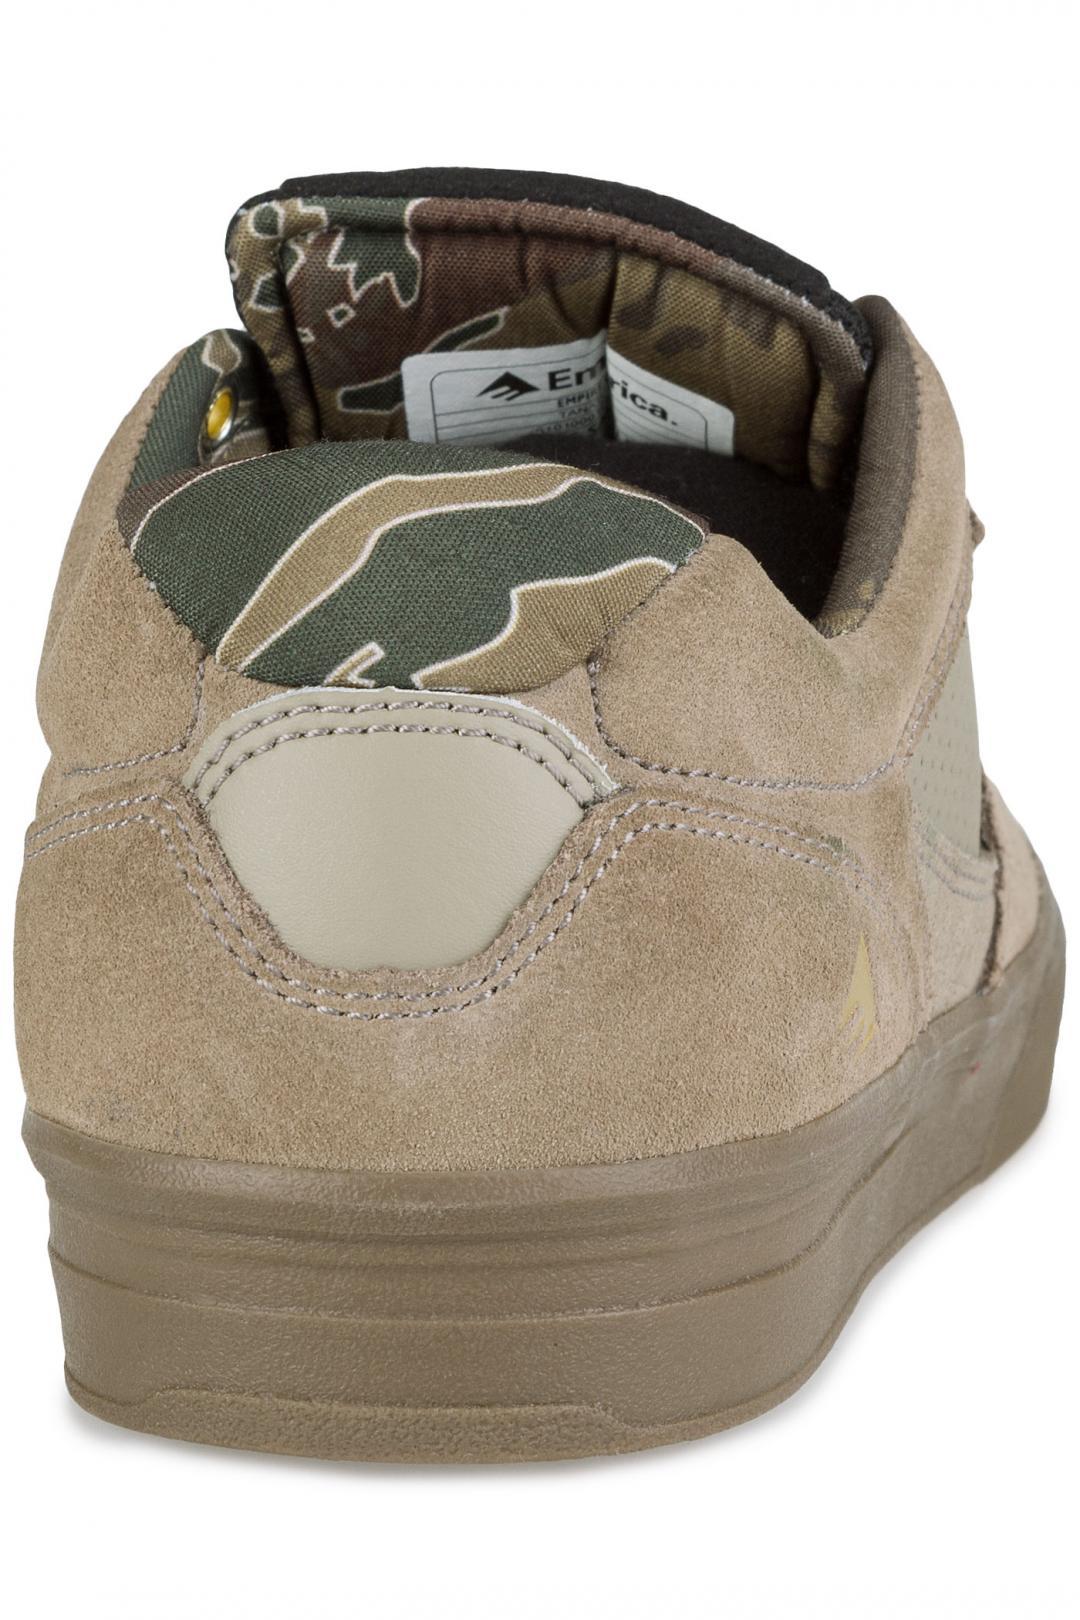 Uomo Emerica Empire G6 tan gum | Sneaker